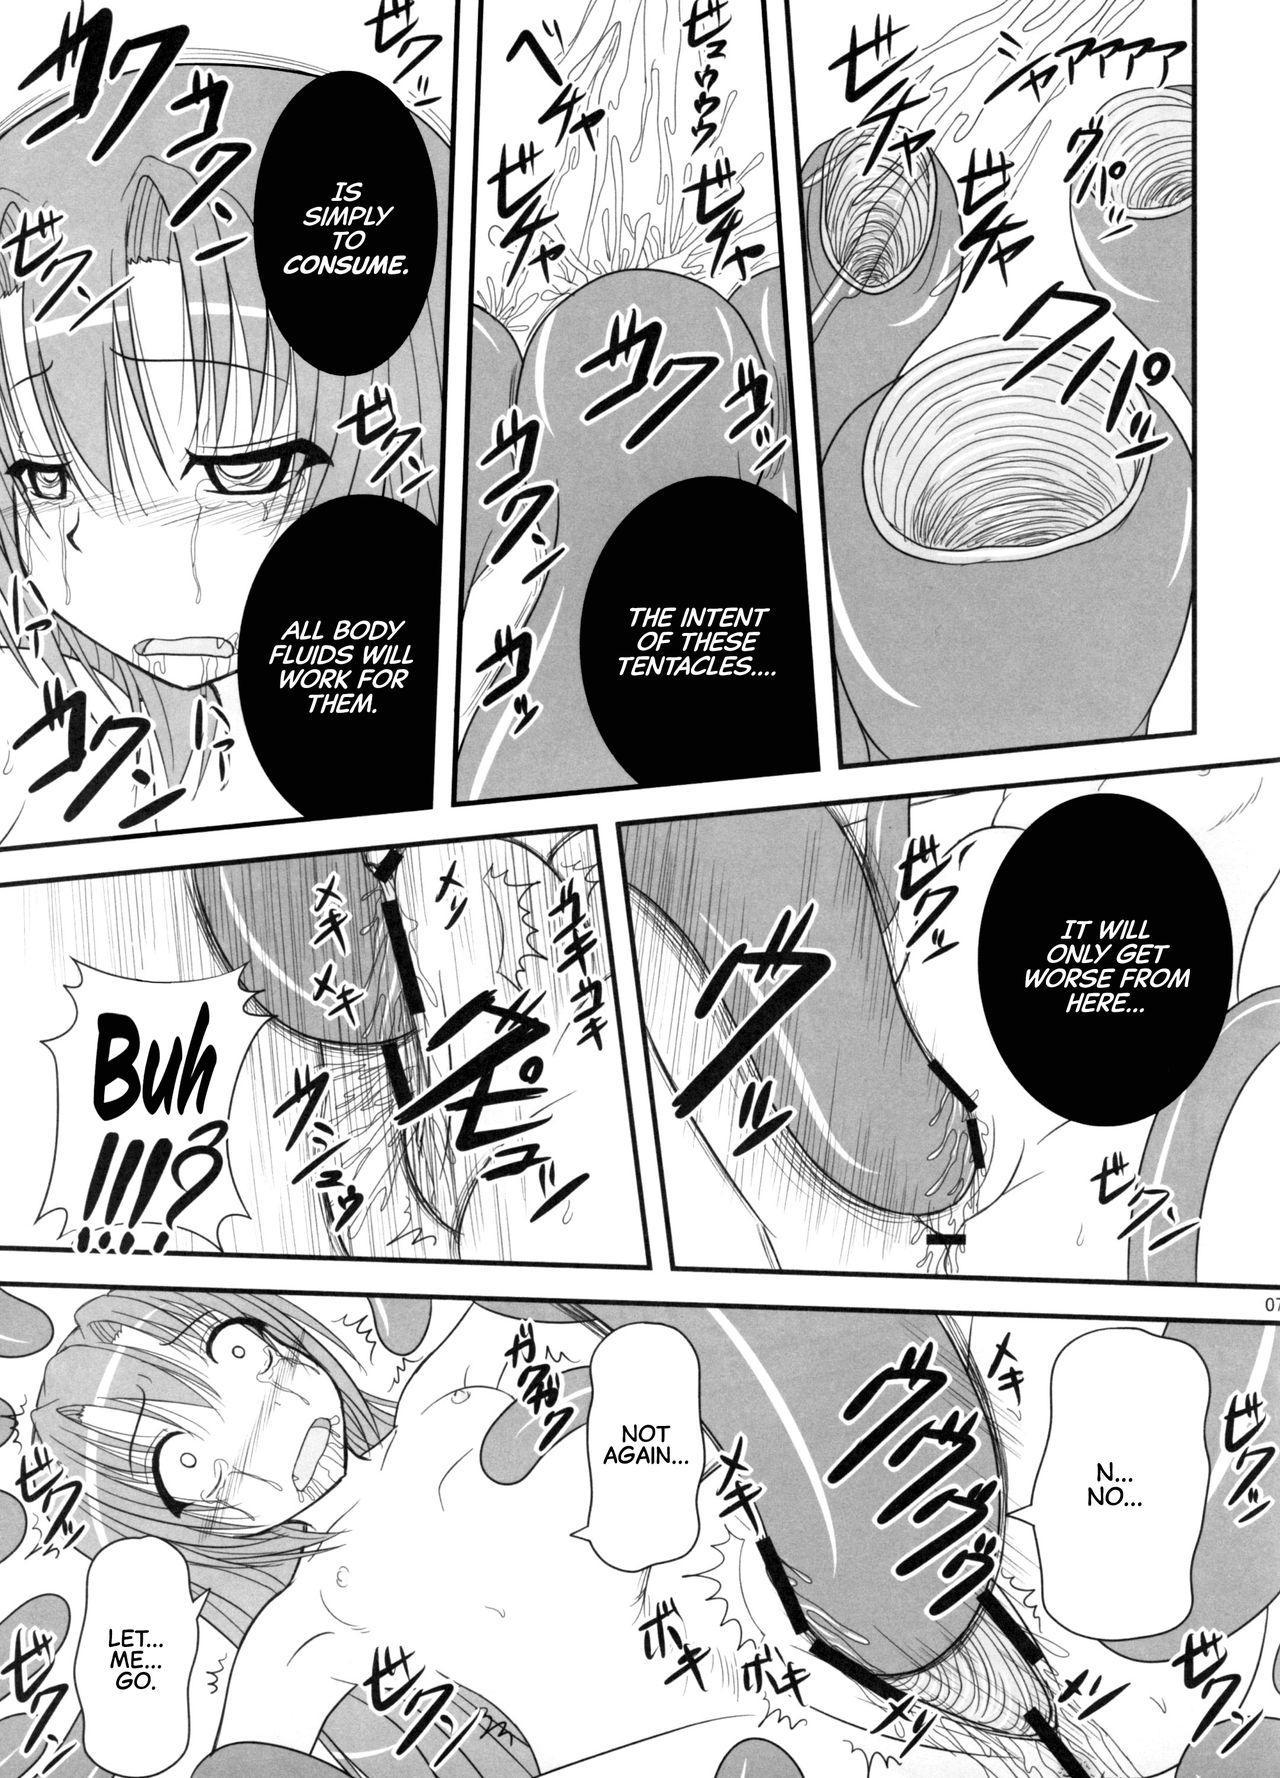 Itsuka Zenshin Funsha no Kuso Usagi | A Shitty Rabbit Gets Repeated Full Body Injections 5